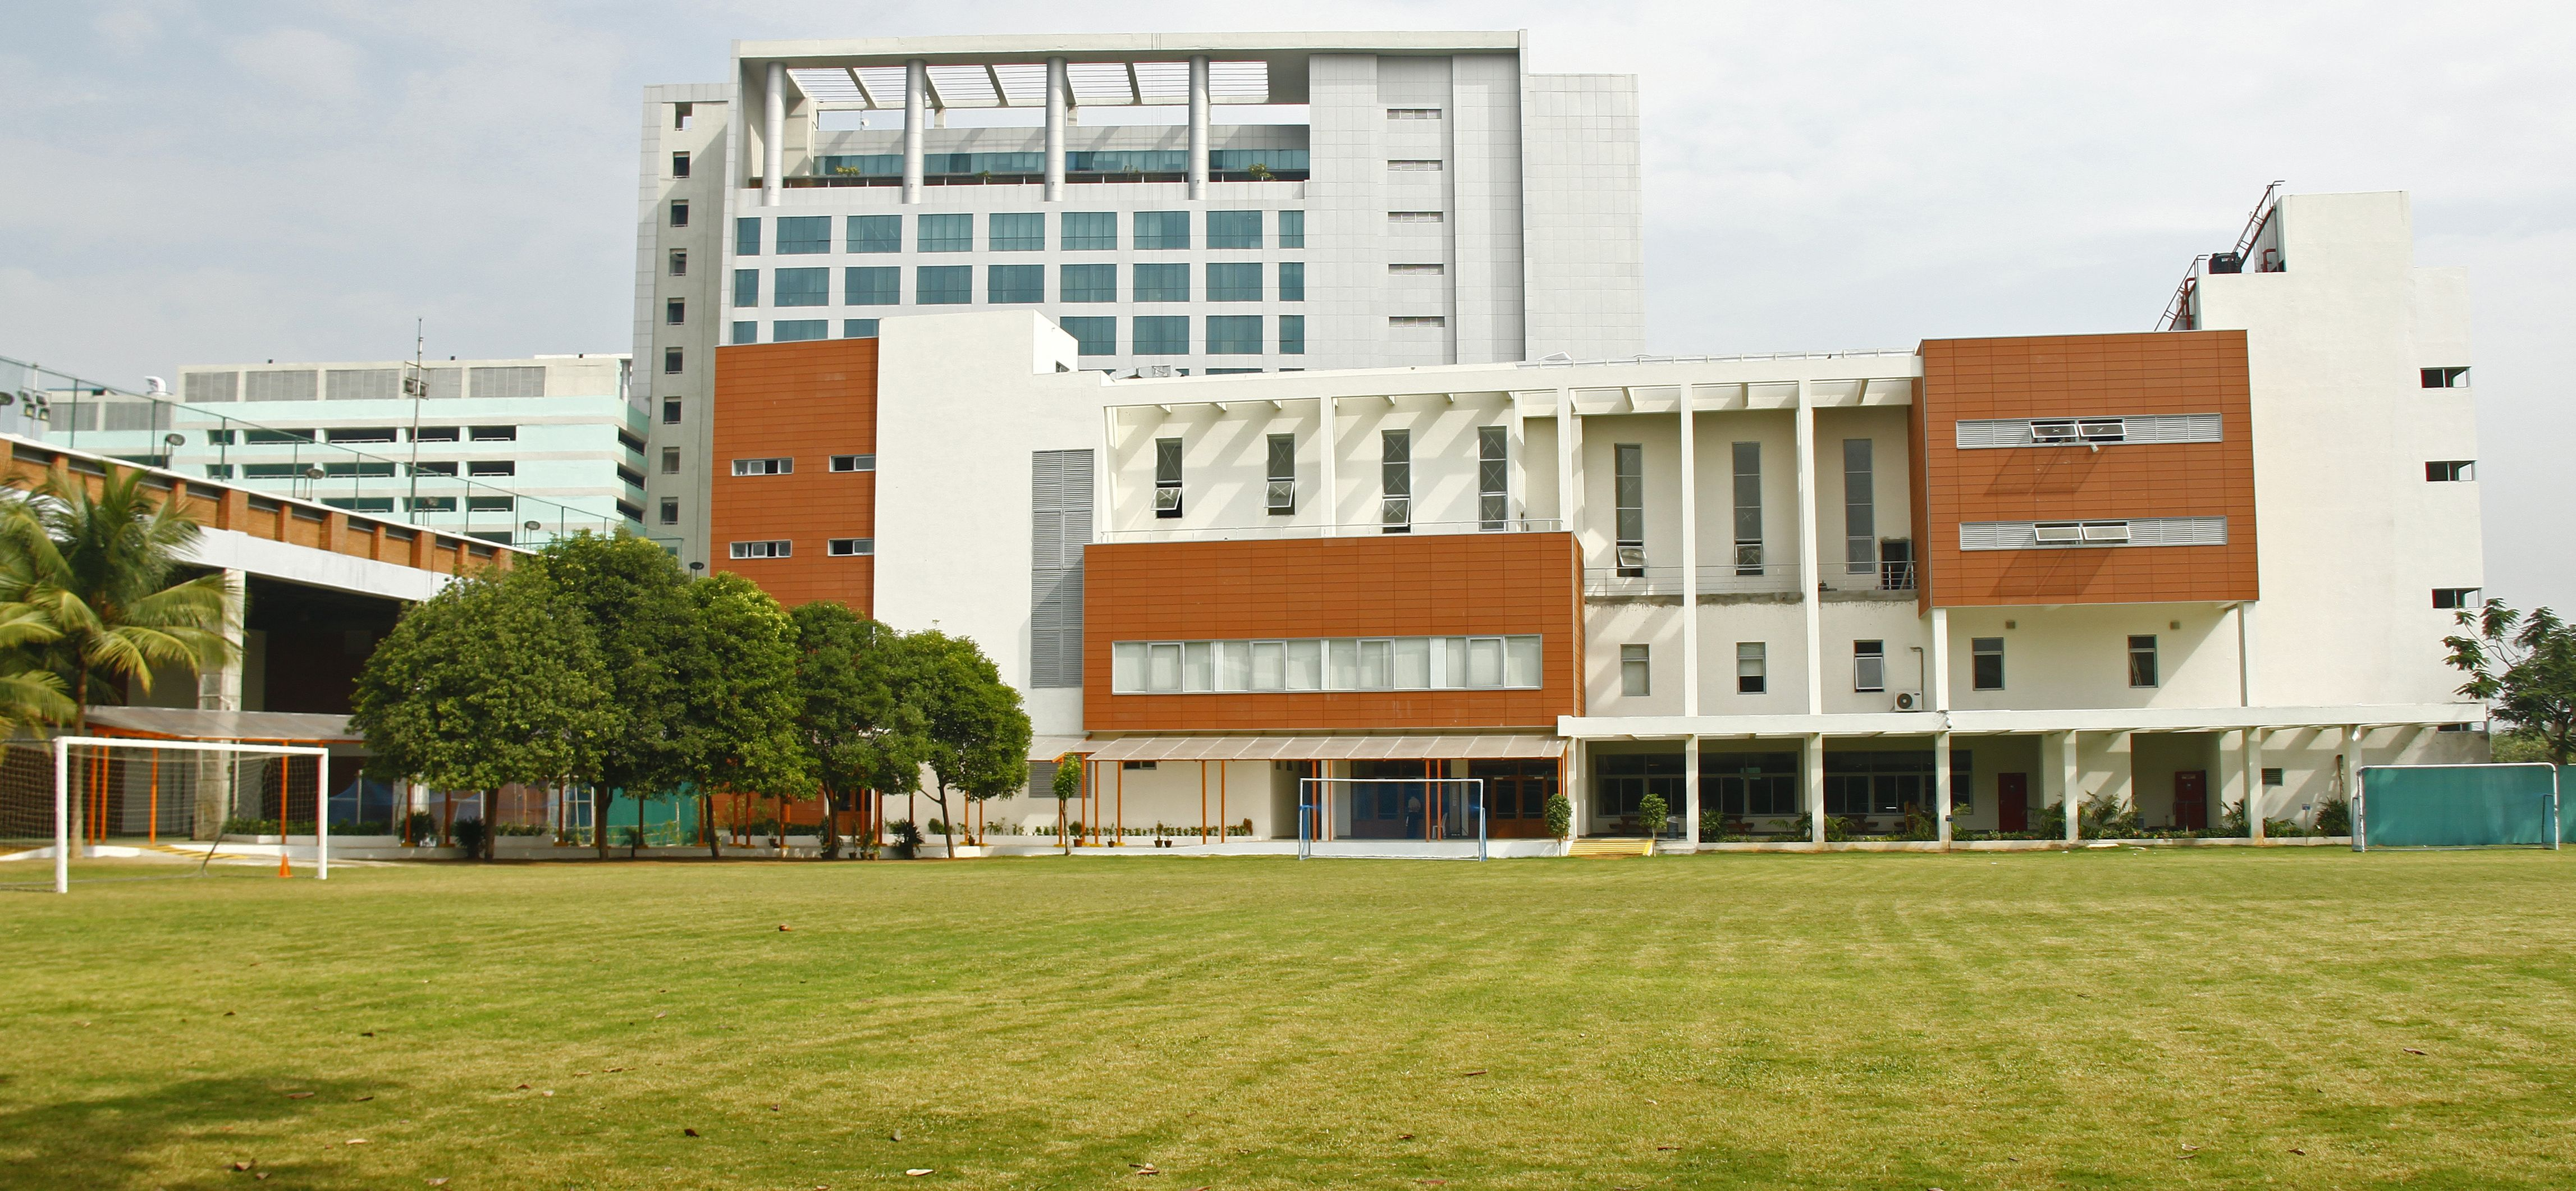 American International School Chennai that has been awarded